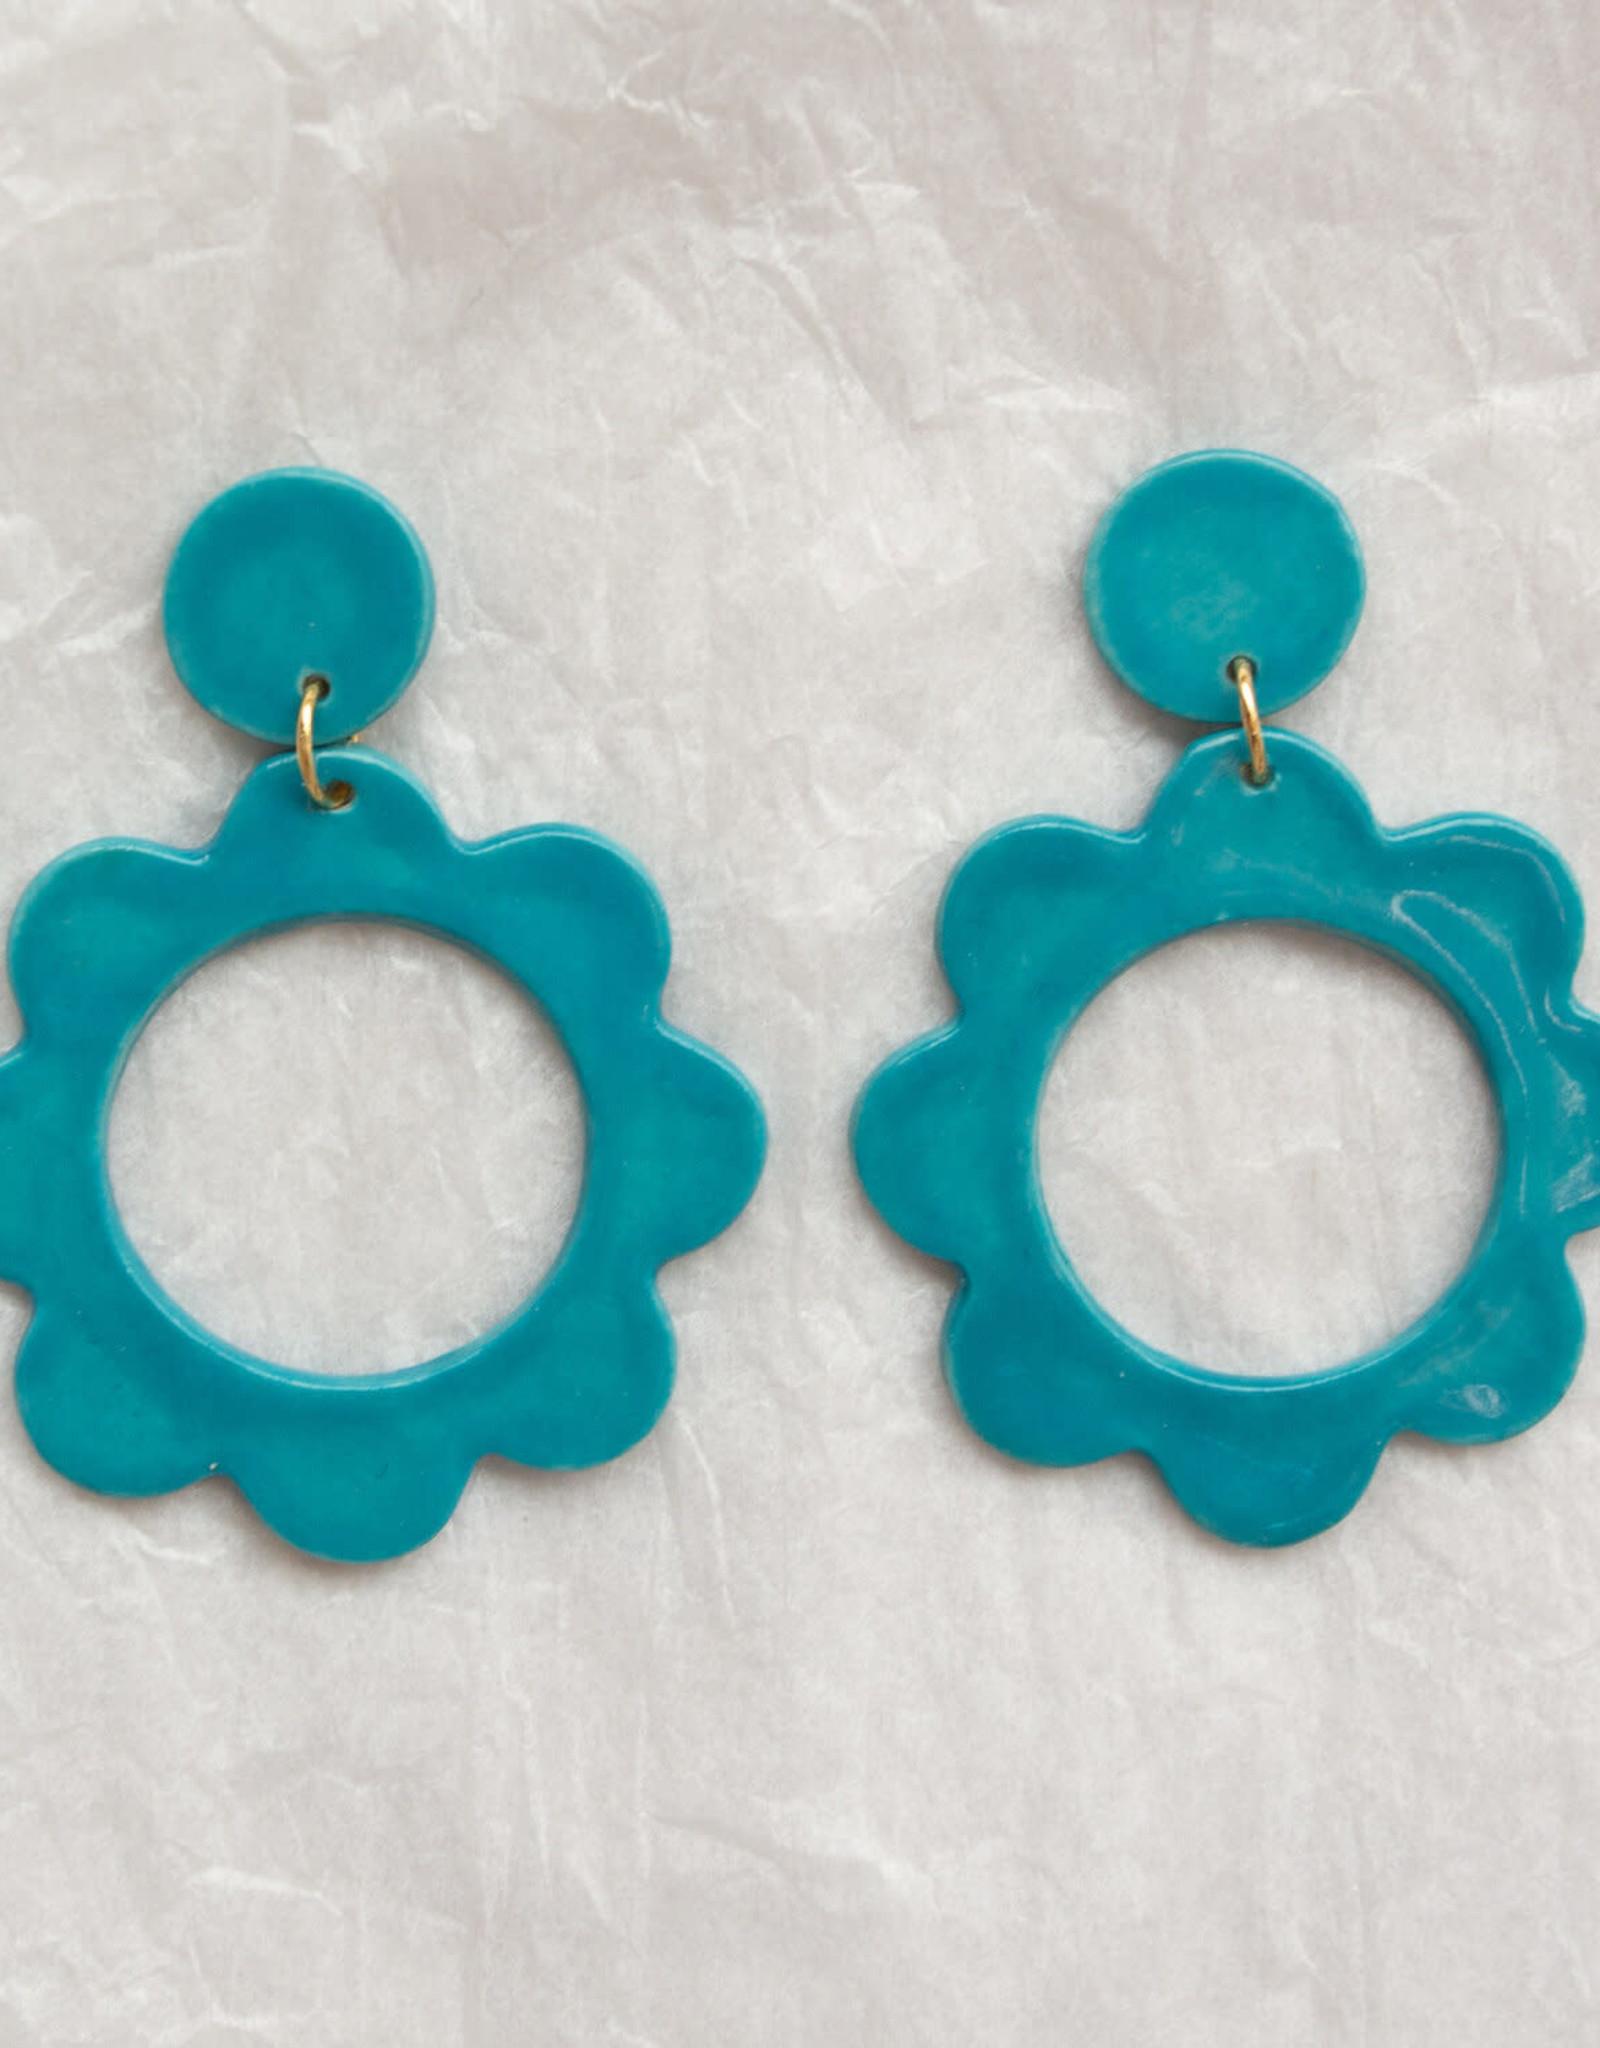 Meghan MacWhirter Marianne Ceramic Earrings - Assorted